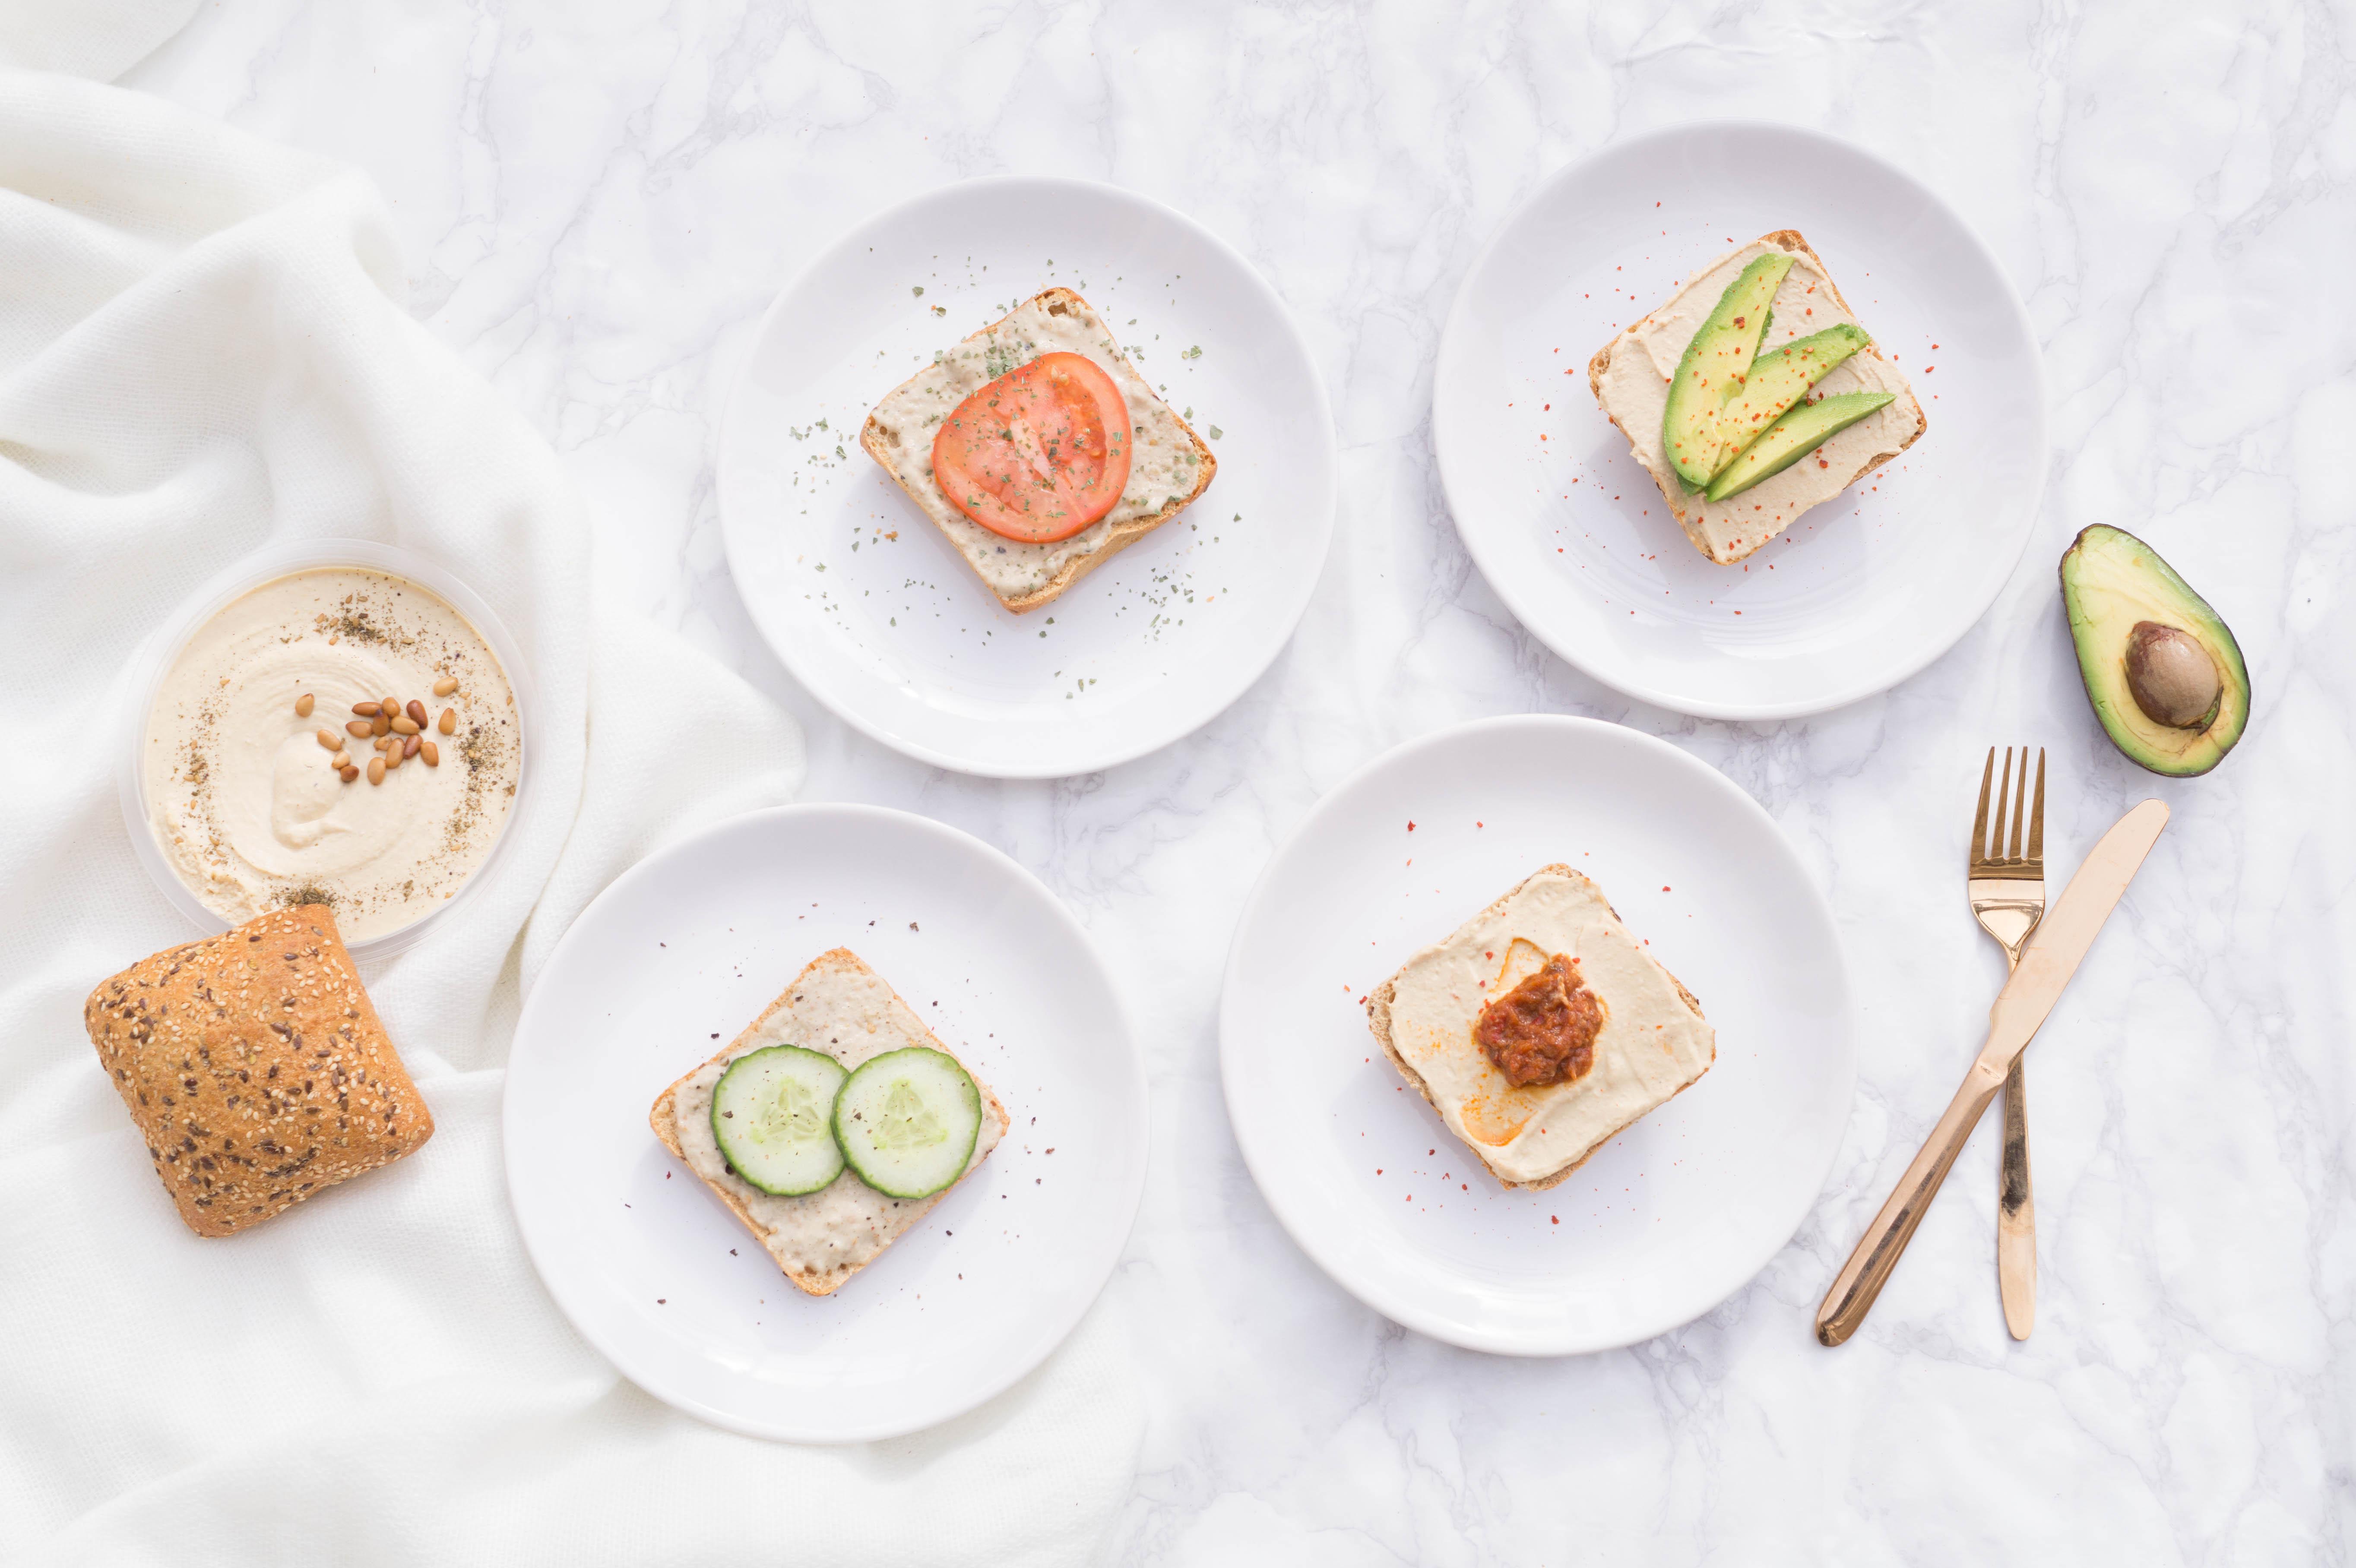 vegan food deli dip hummus guacamole sandwiches